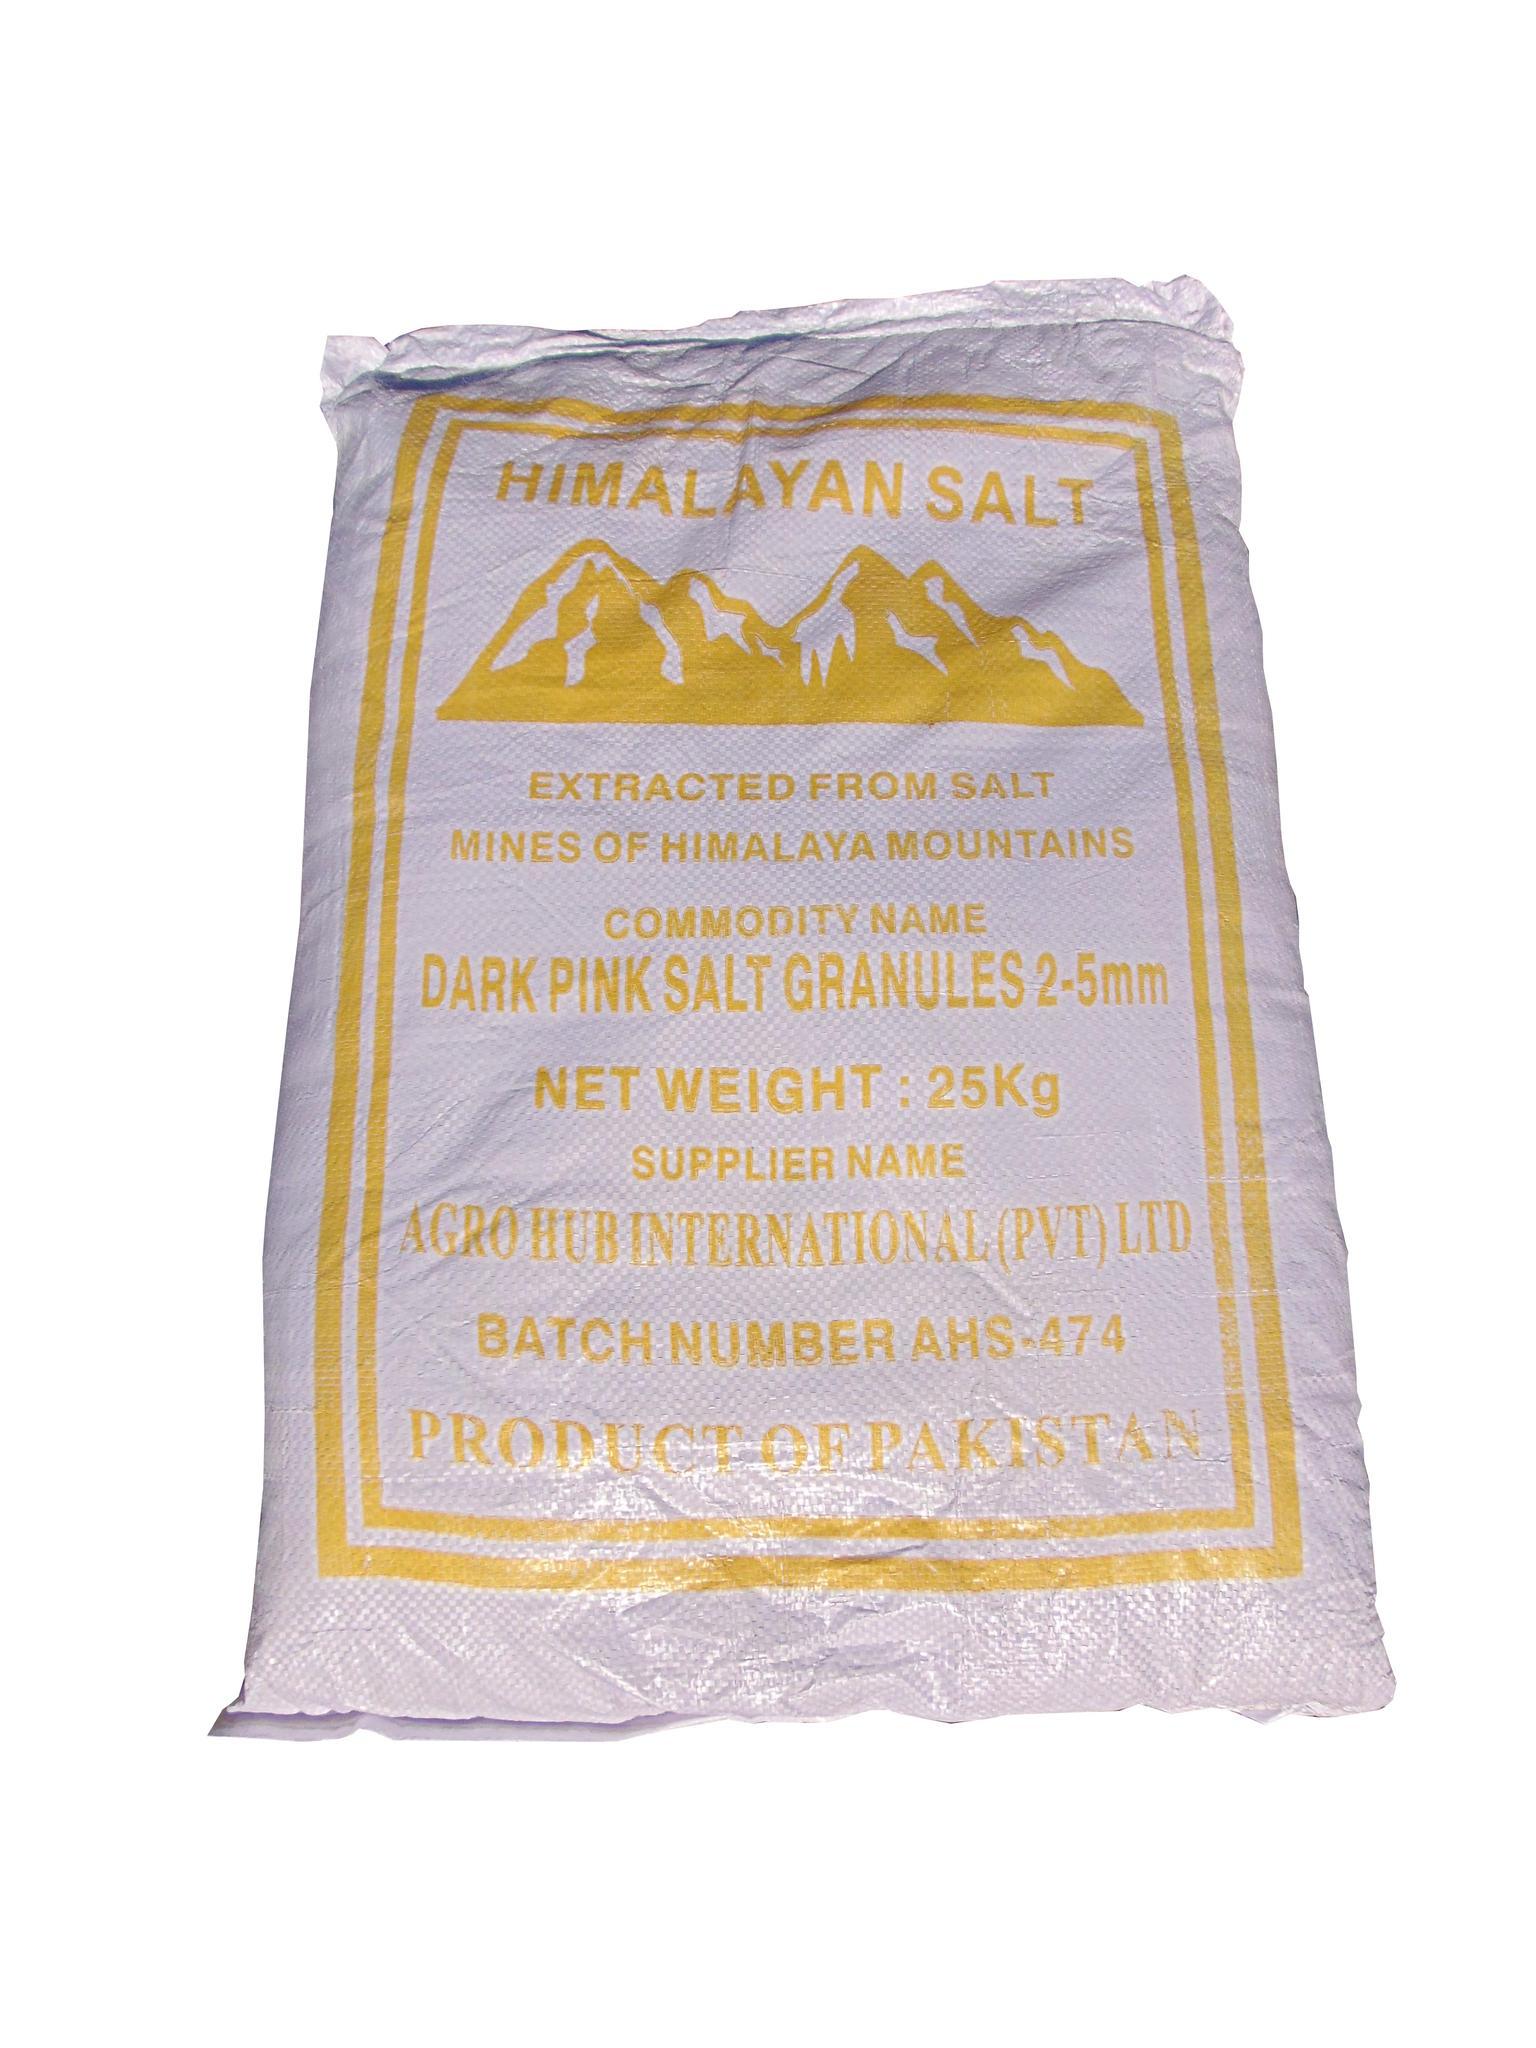 sel de l'Himalaya rose grossier 25kg